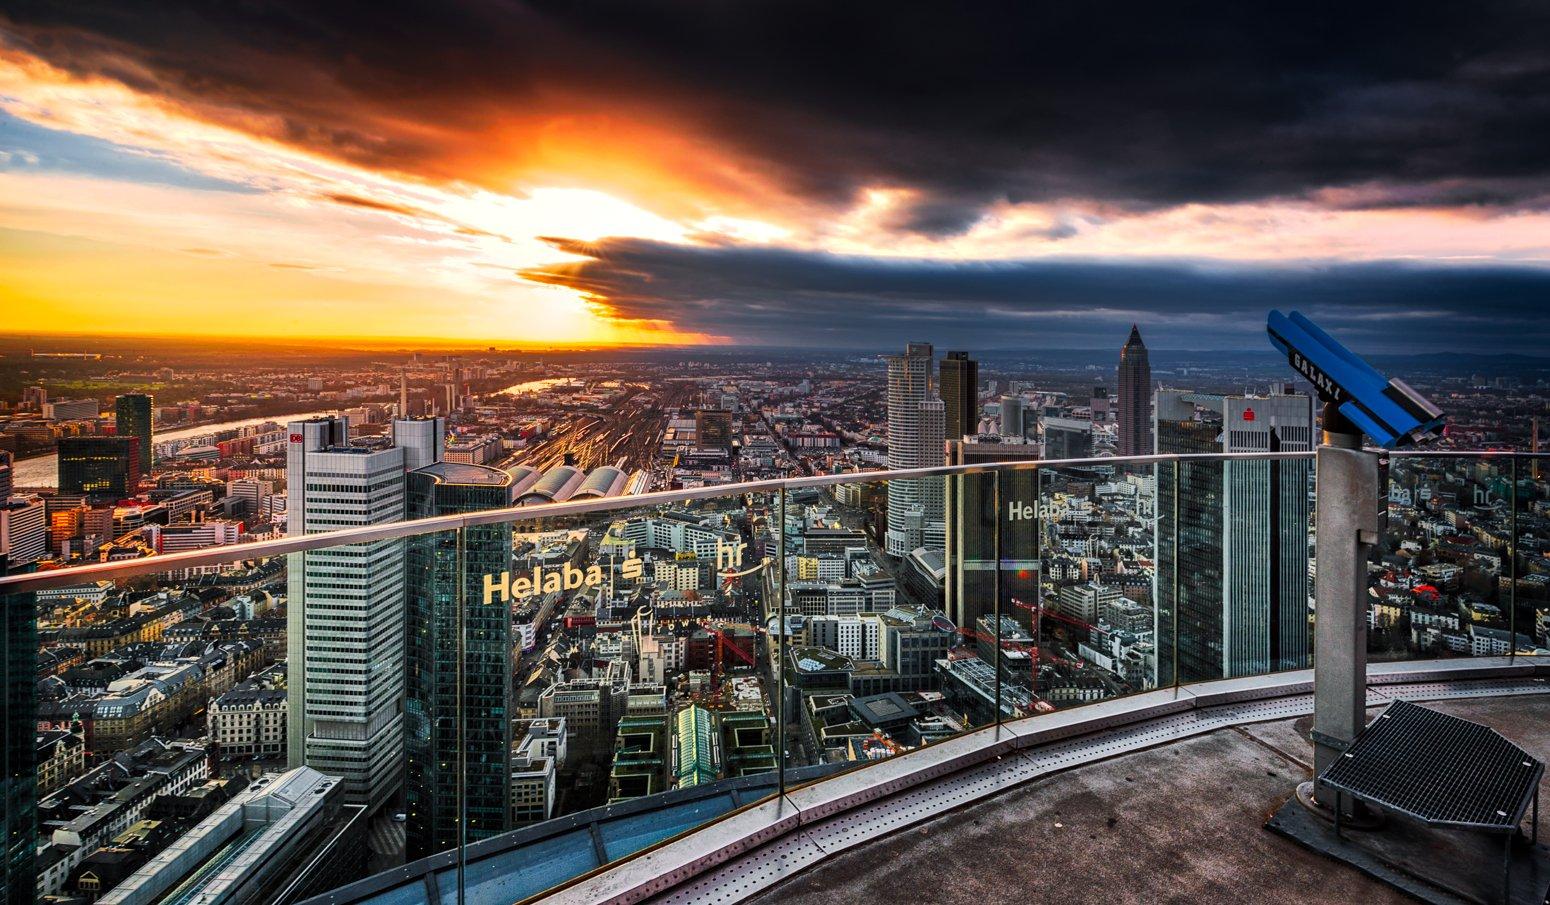 Stormachtige lucht boven Frankfurt am Main, Duitsland vanaf de Main Tower.